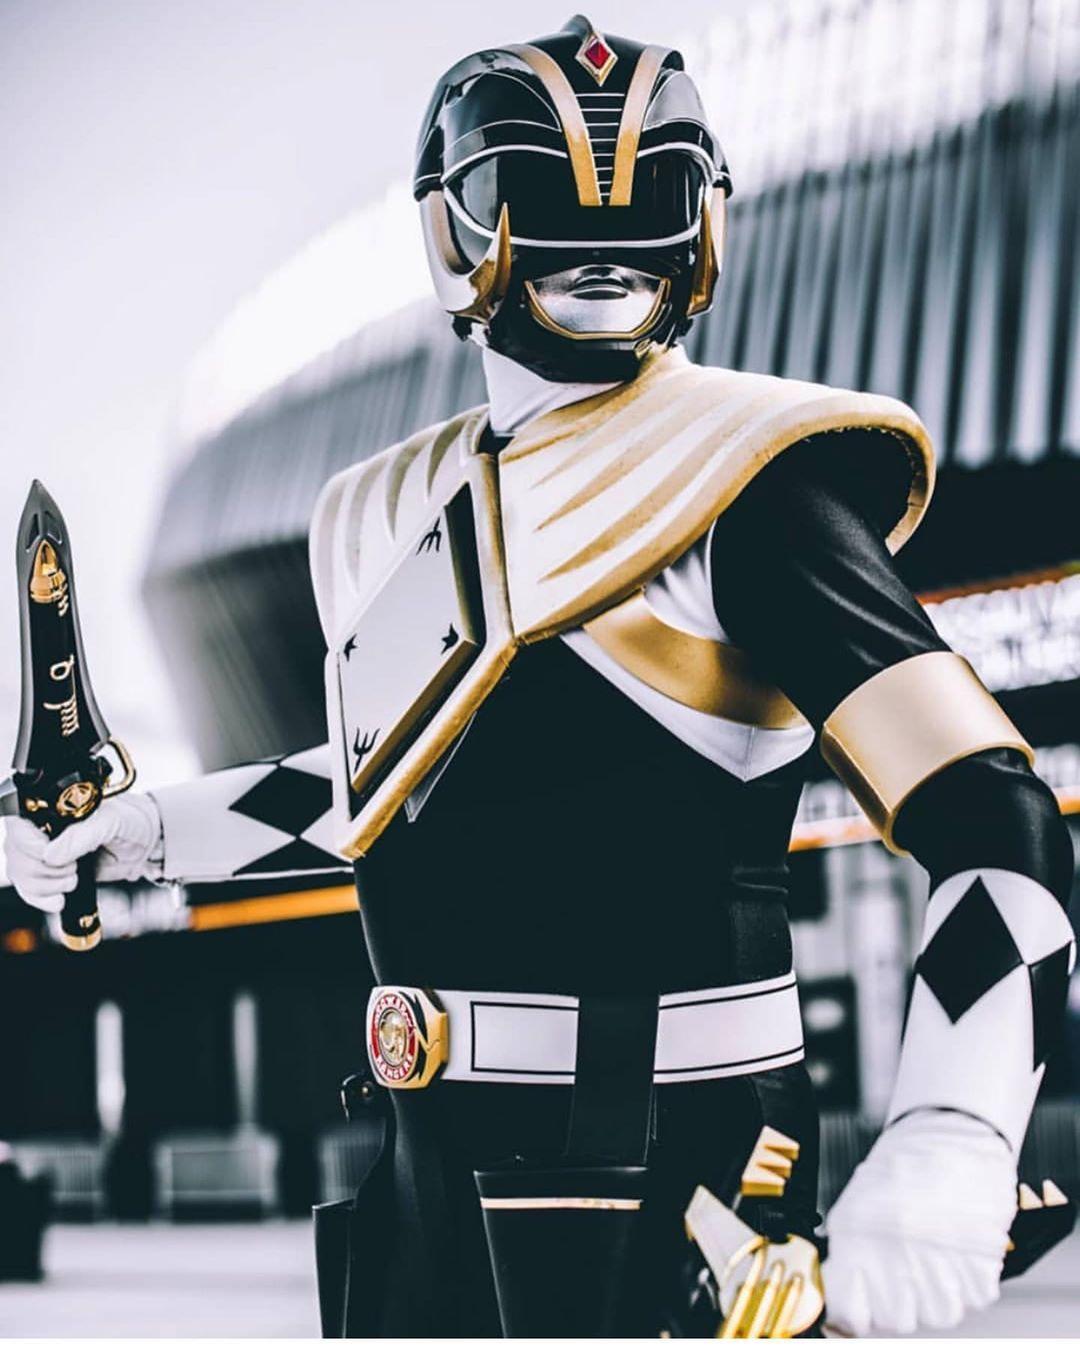 Azael Garcia Salas Mr Azlo On Instagram Legendary Mastodon Black Ranger Helmet Made By Us Thank You So Mu Power Ranger Black Power Rangers Helmet Ranger